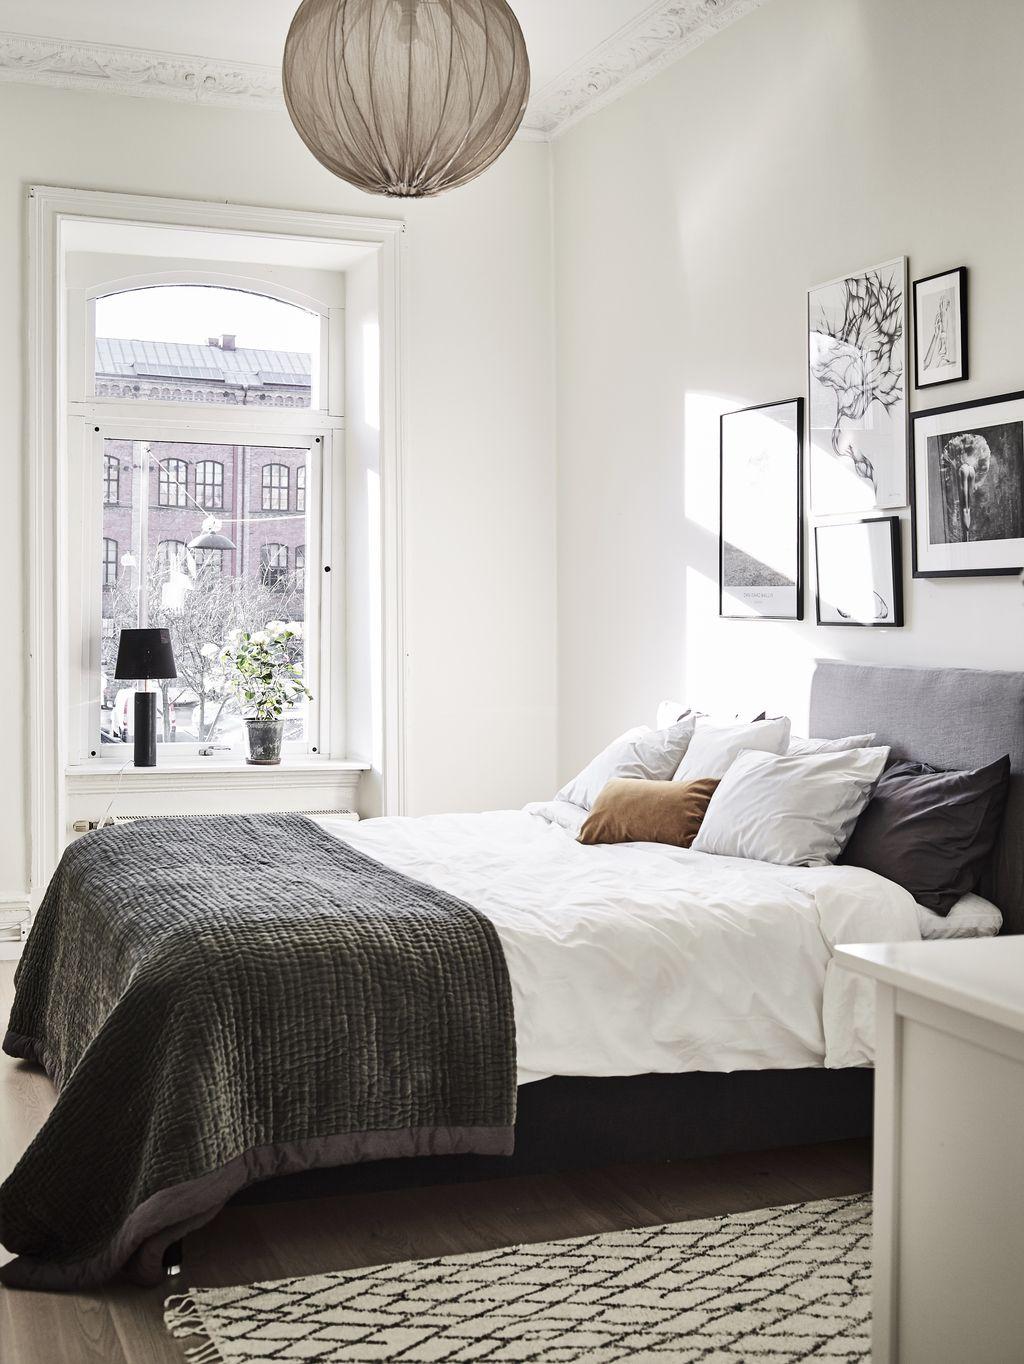 Scandinavian Interior Design Wohnzimmer Skandinavisches Schlafzimmer Schlafzimmer Und Schlafzimmer Ideen